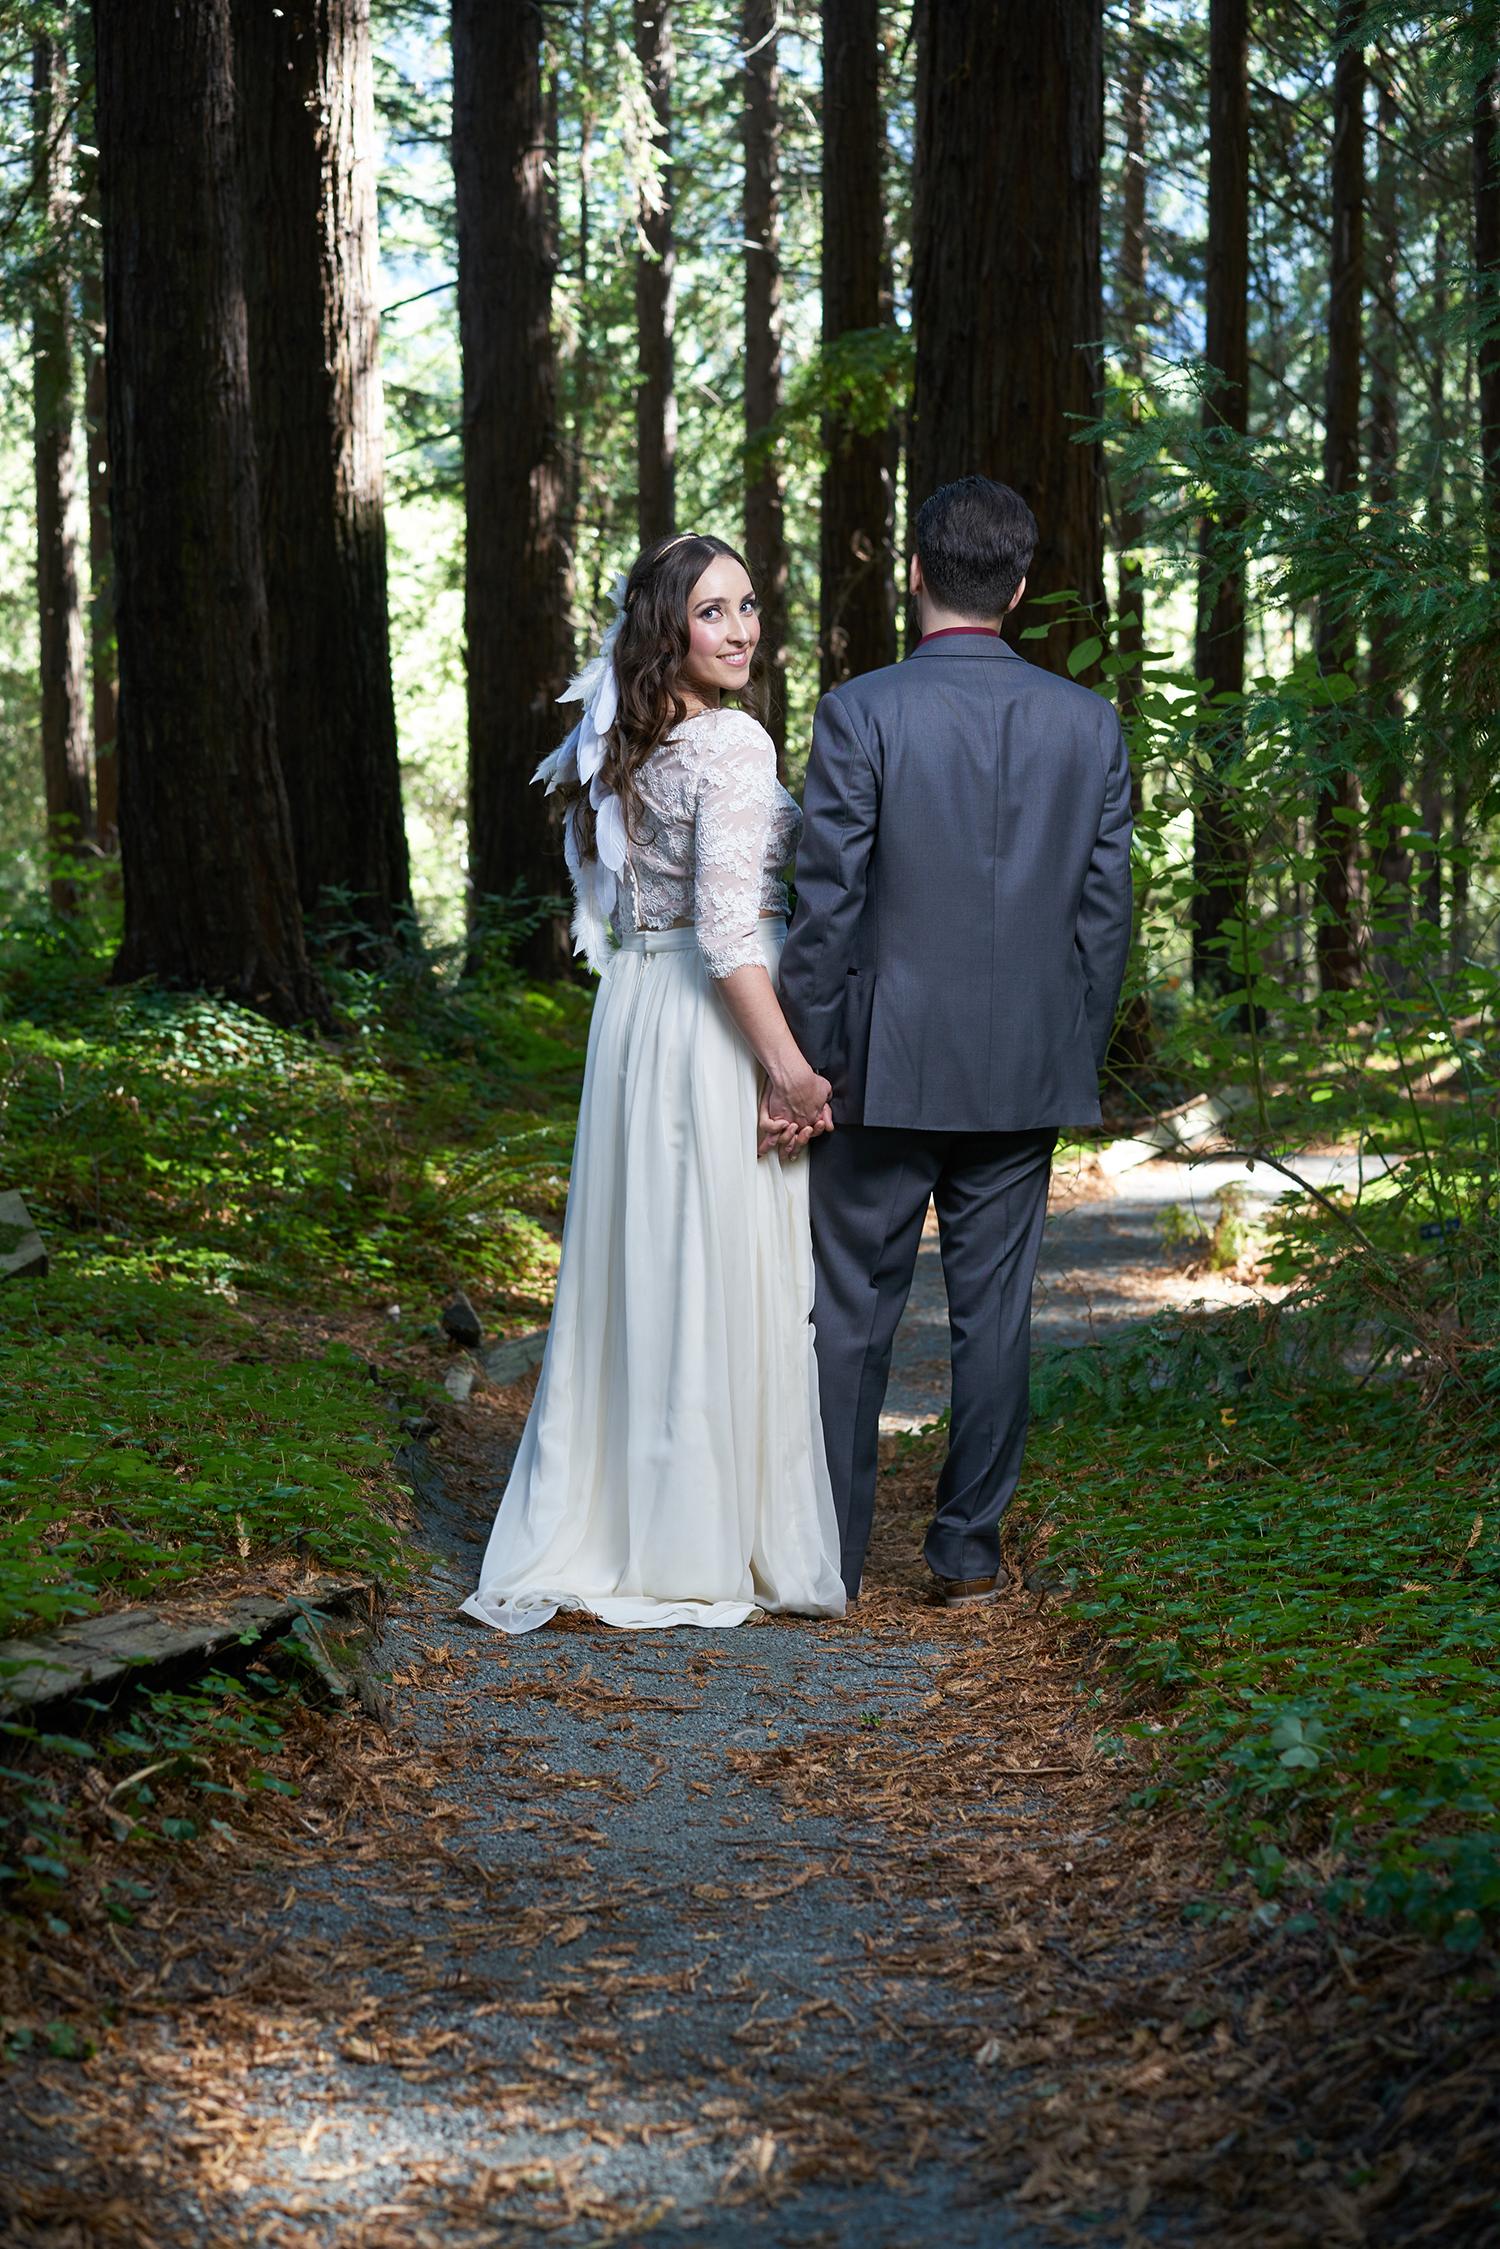 100717_Lenora_Jesse0399-weddingdress-bride-weddingphotography-best-weddingphotographer-bridal-groom-wedding-engagementring-proposal-brides-diamondring-sonyalpha-sony-sonya7rii-sanfrancisco-sf-bayarea-photographer-profoto-berkeley-botanical-garden.jpg